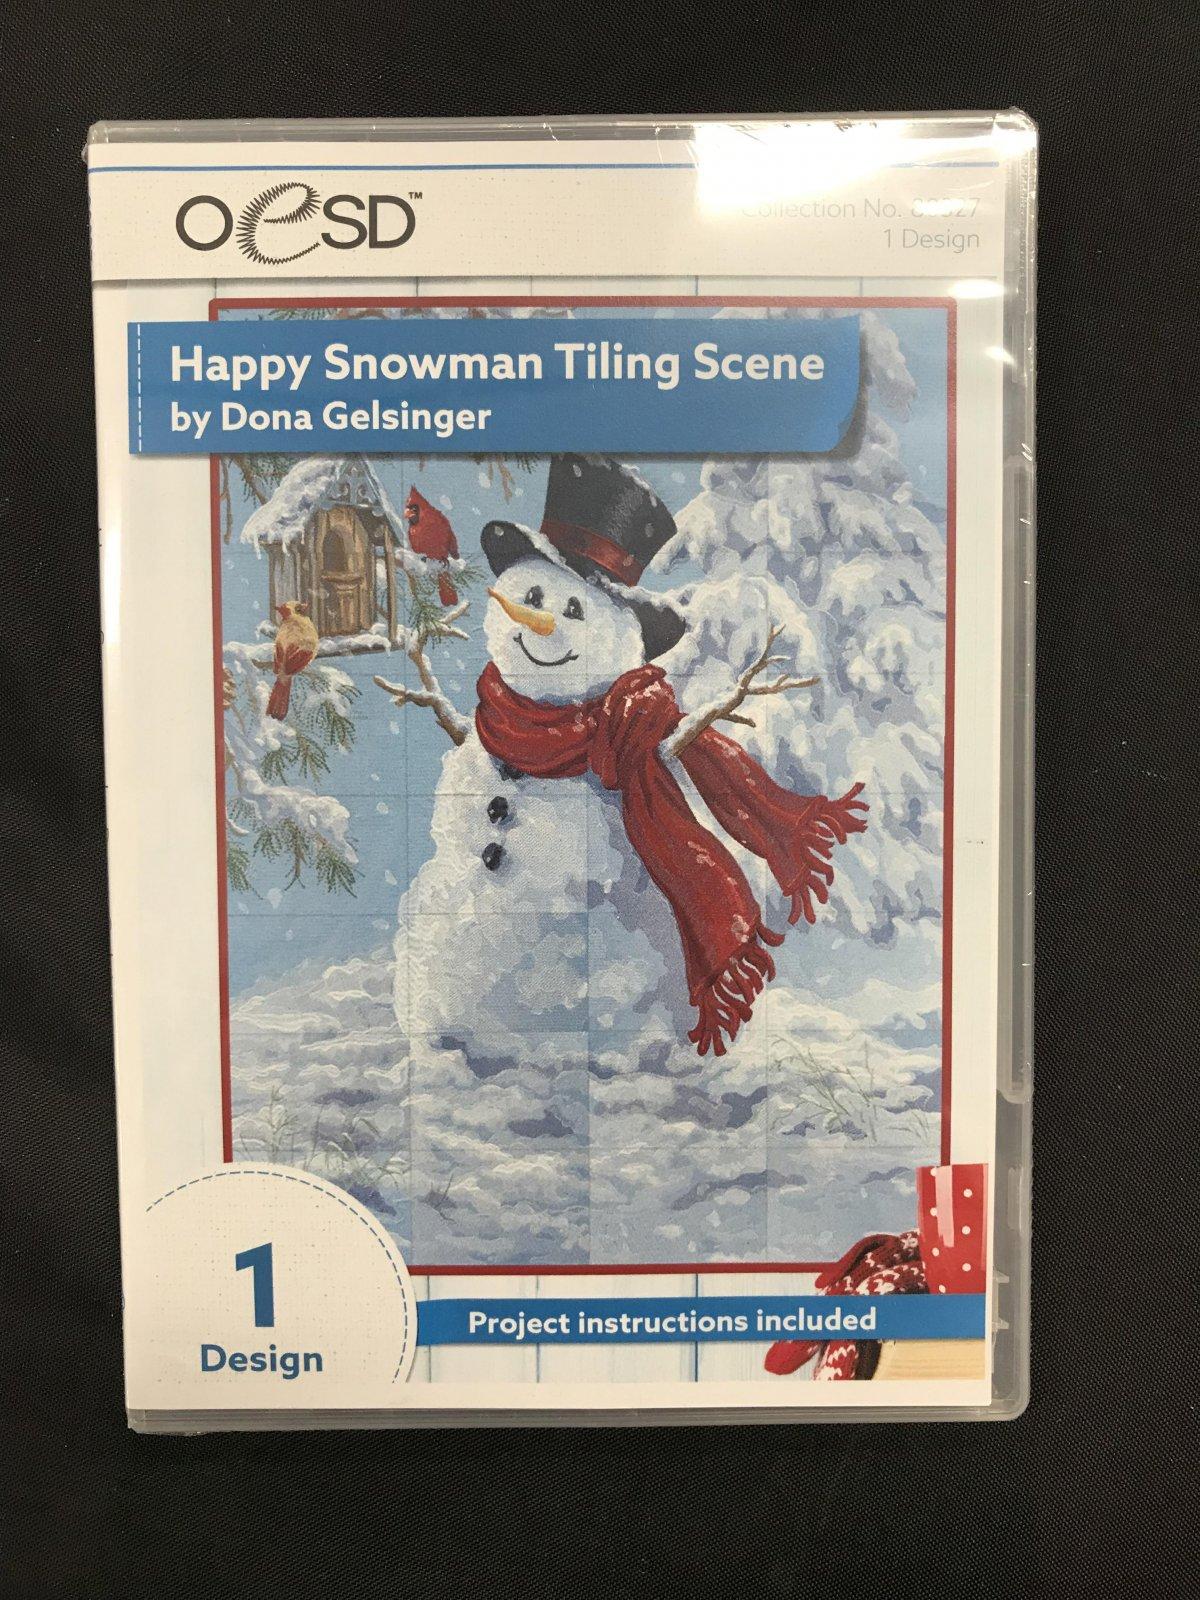 OESD Happy Snowman Tile Scene CD